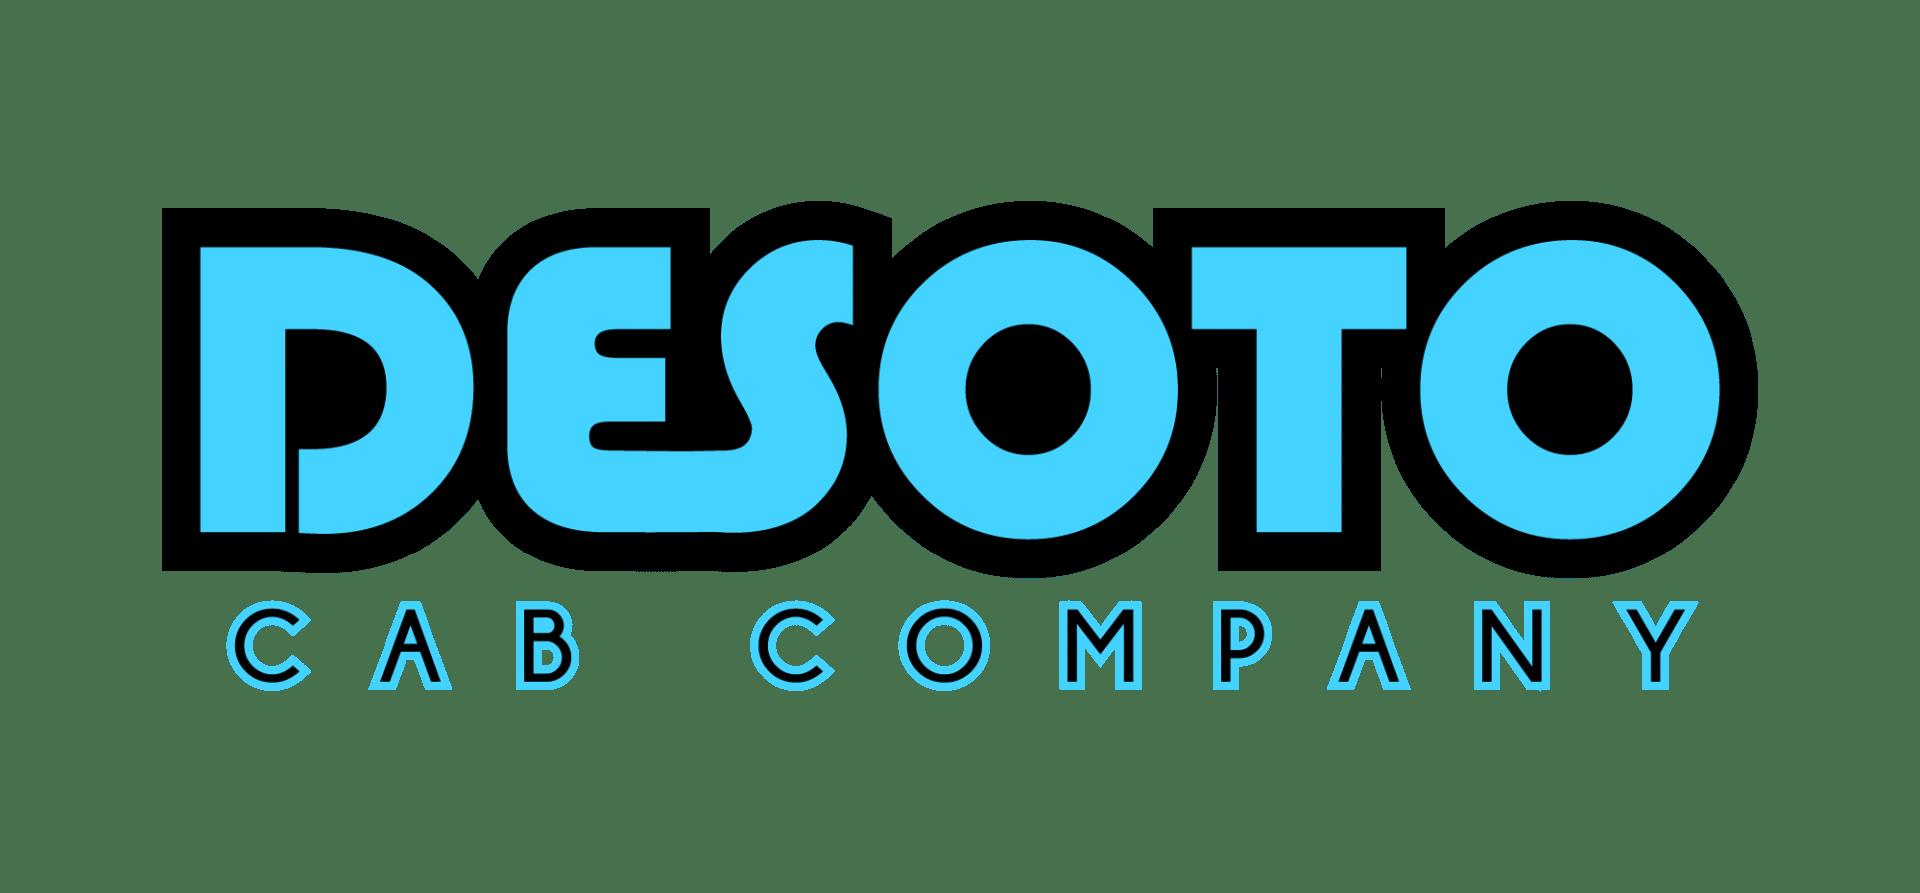 DeSoto Cab Co.